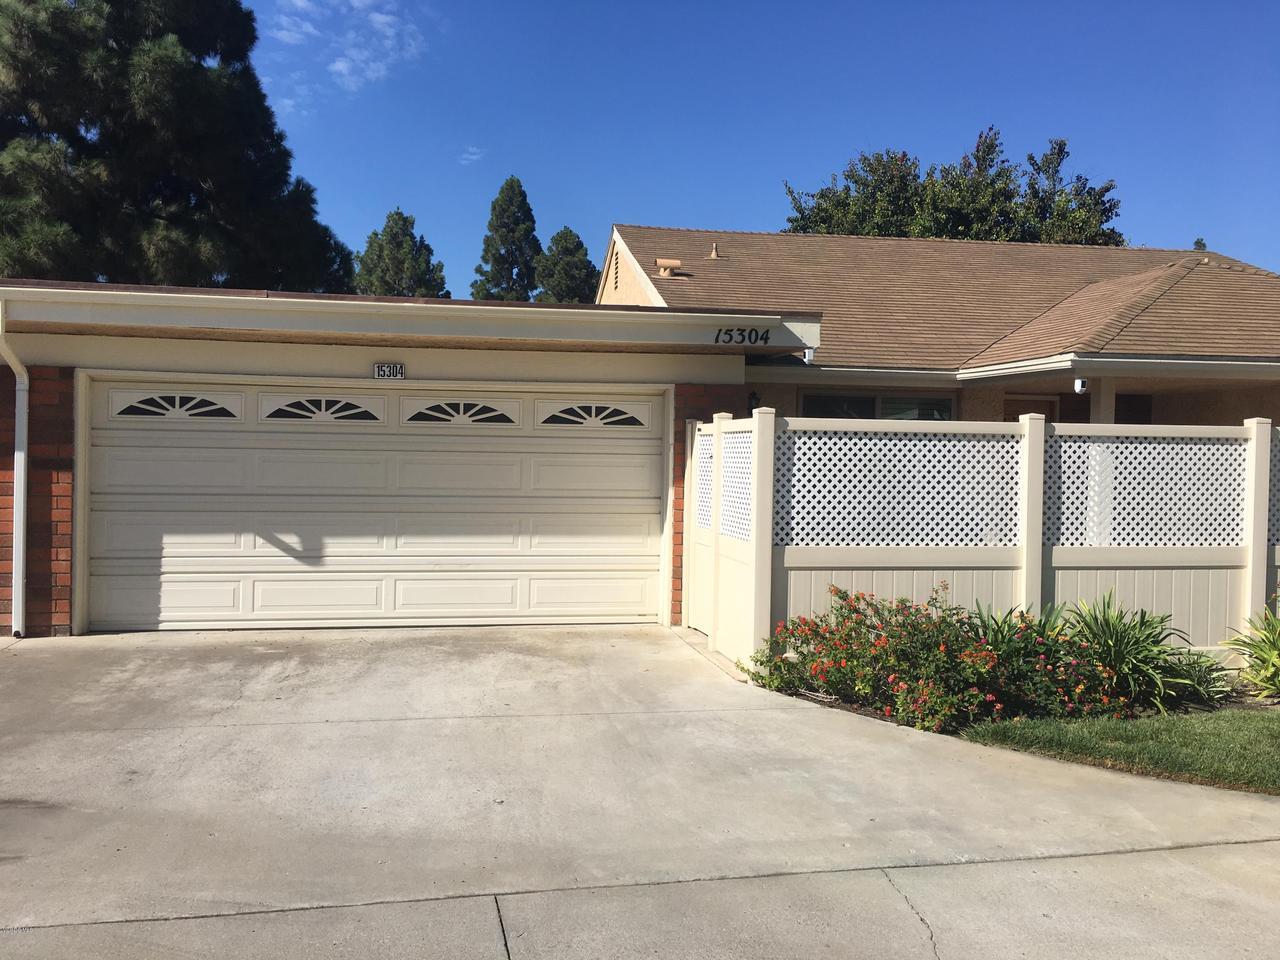 Photo of 15304 VILLAGE 15, Camarillo, CA 93012